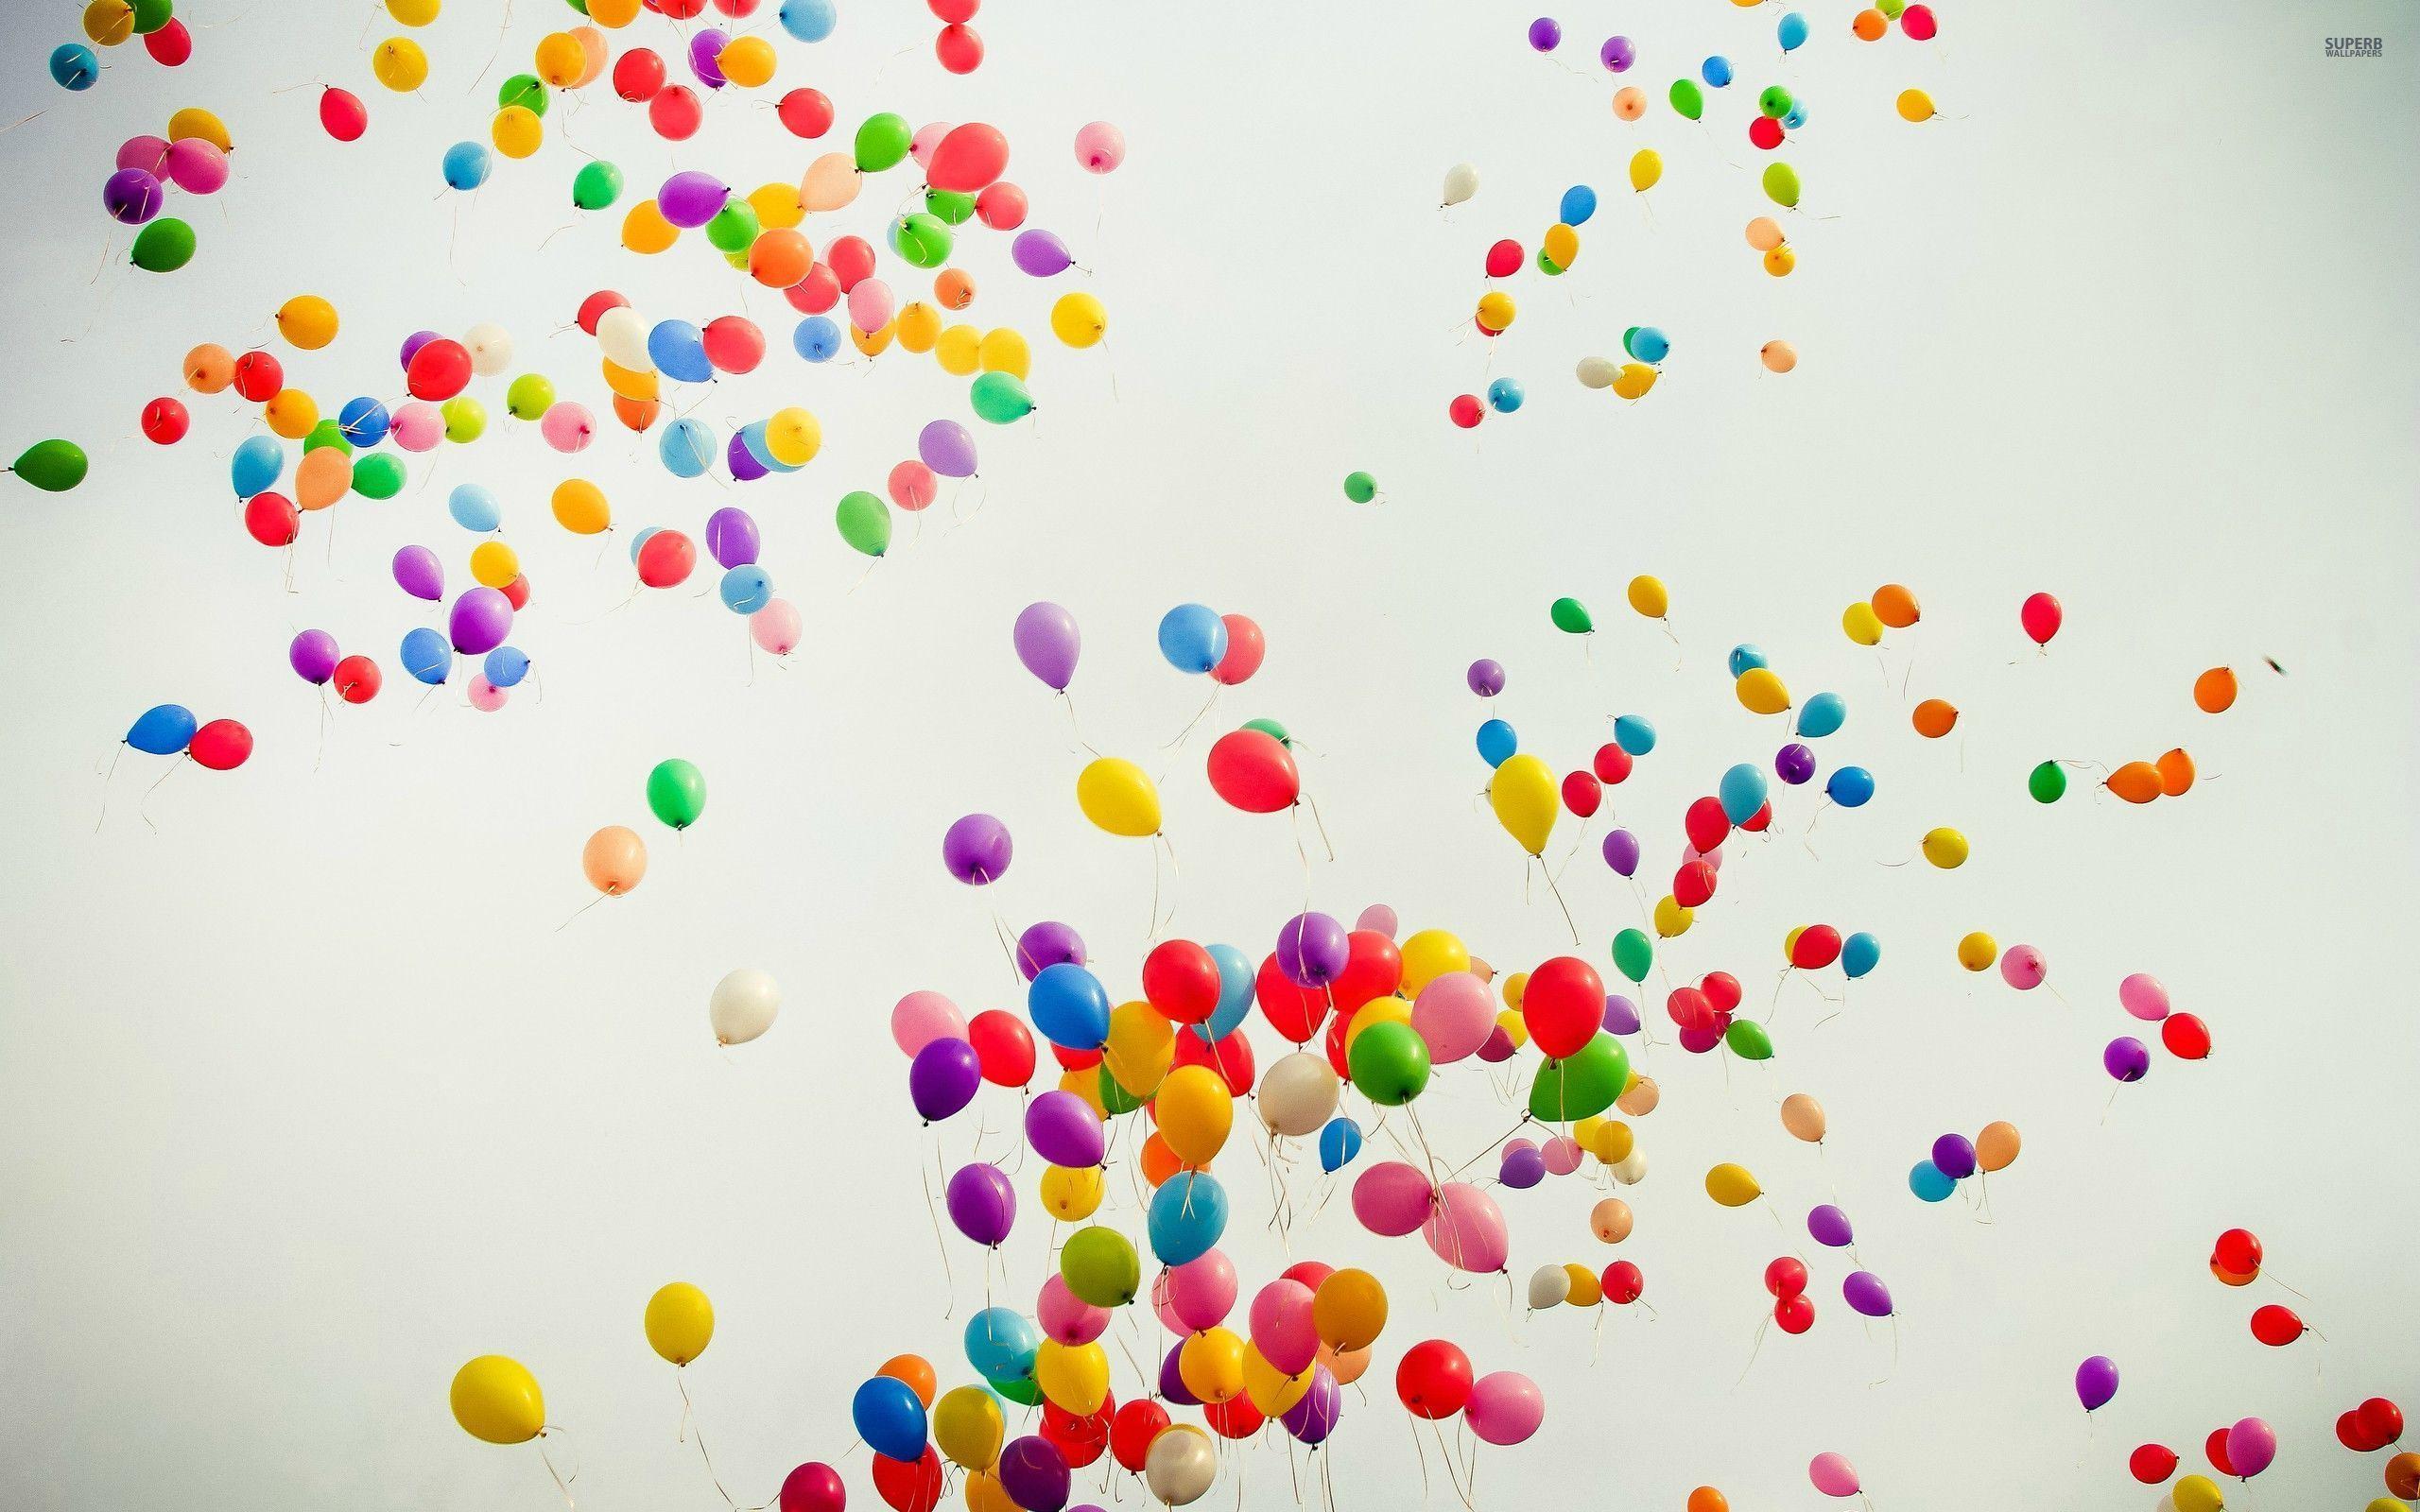 Colorful Balloons HD Desktop Mobile Wallpaper Background 2560x1600